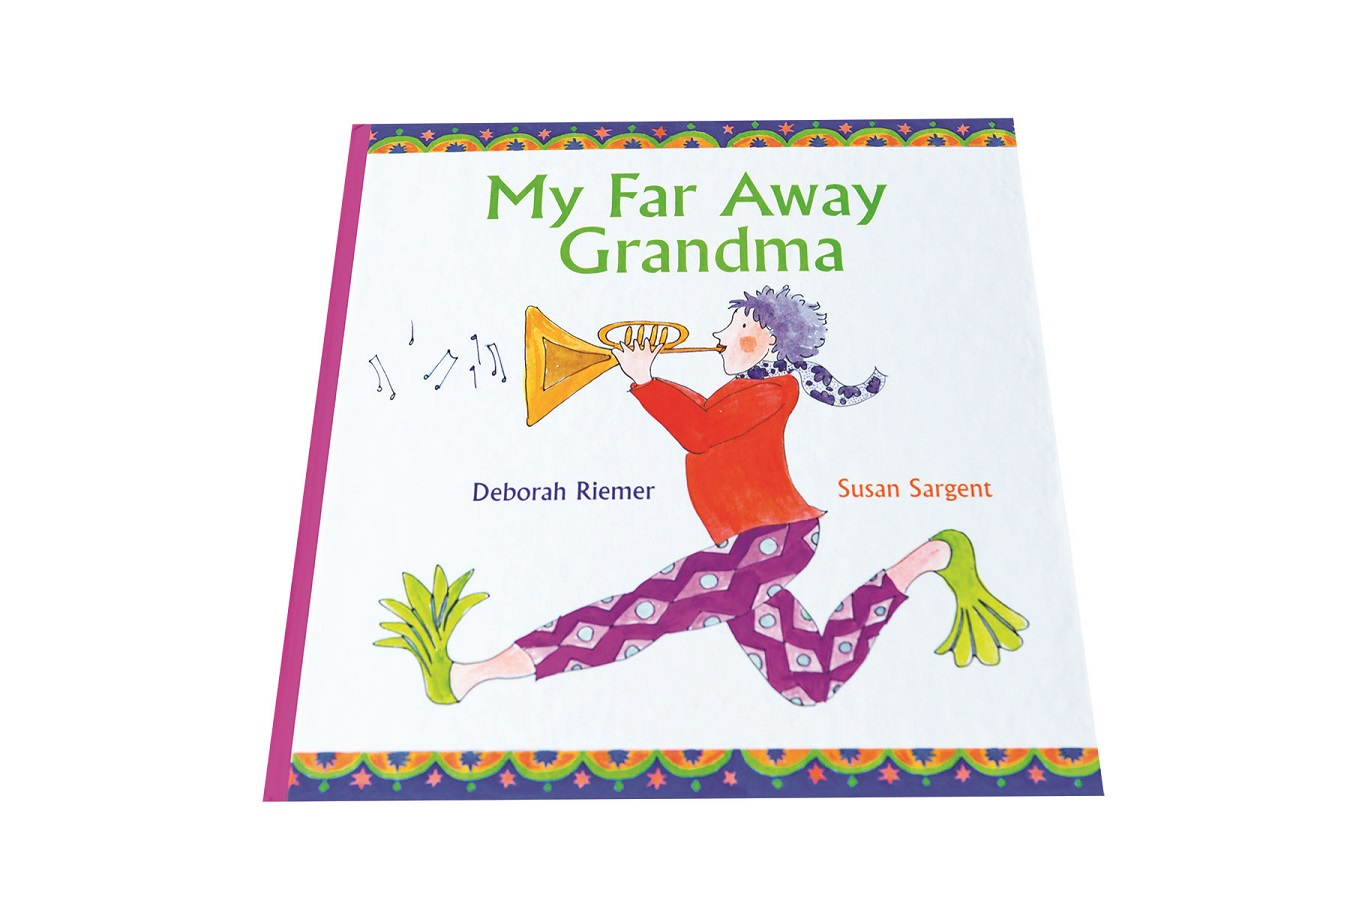 My Far Away Grandma